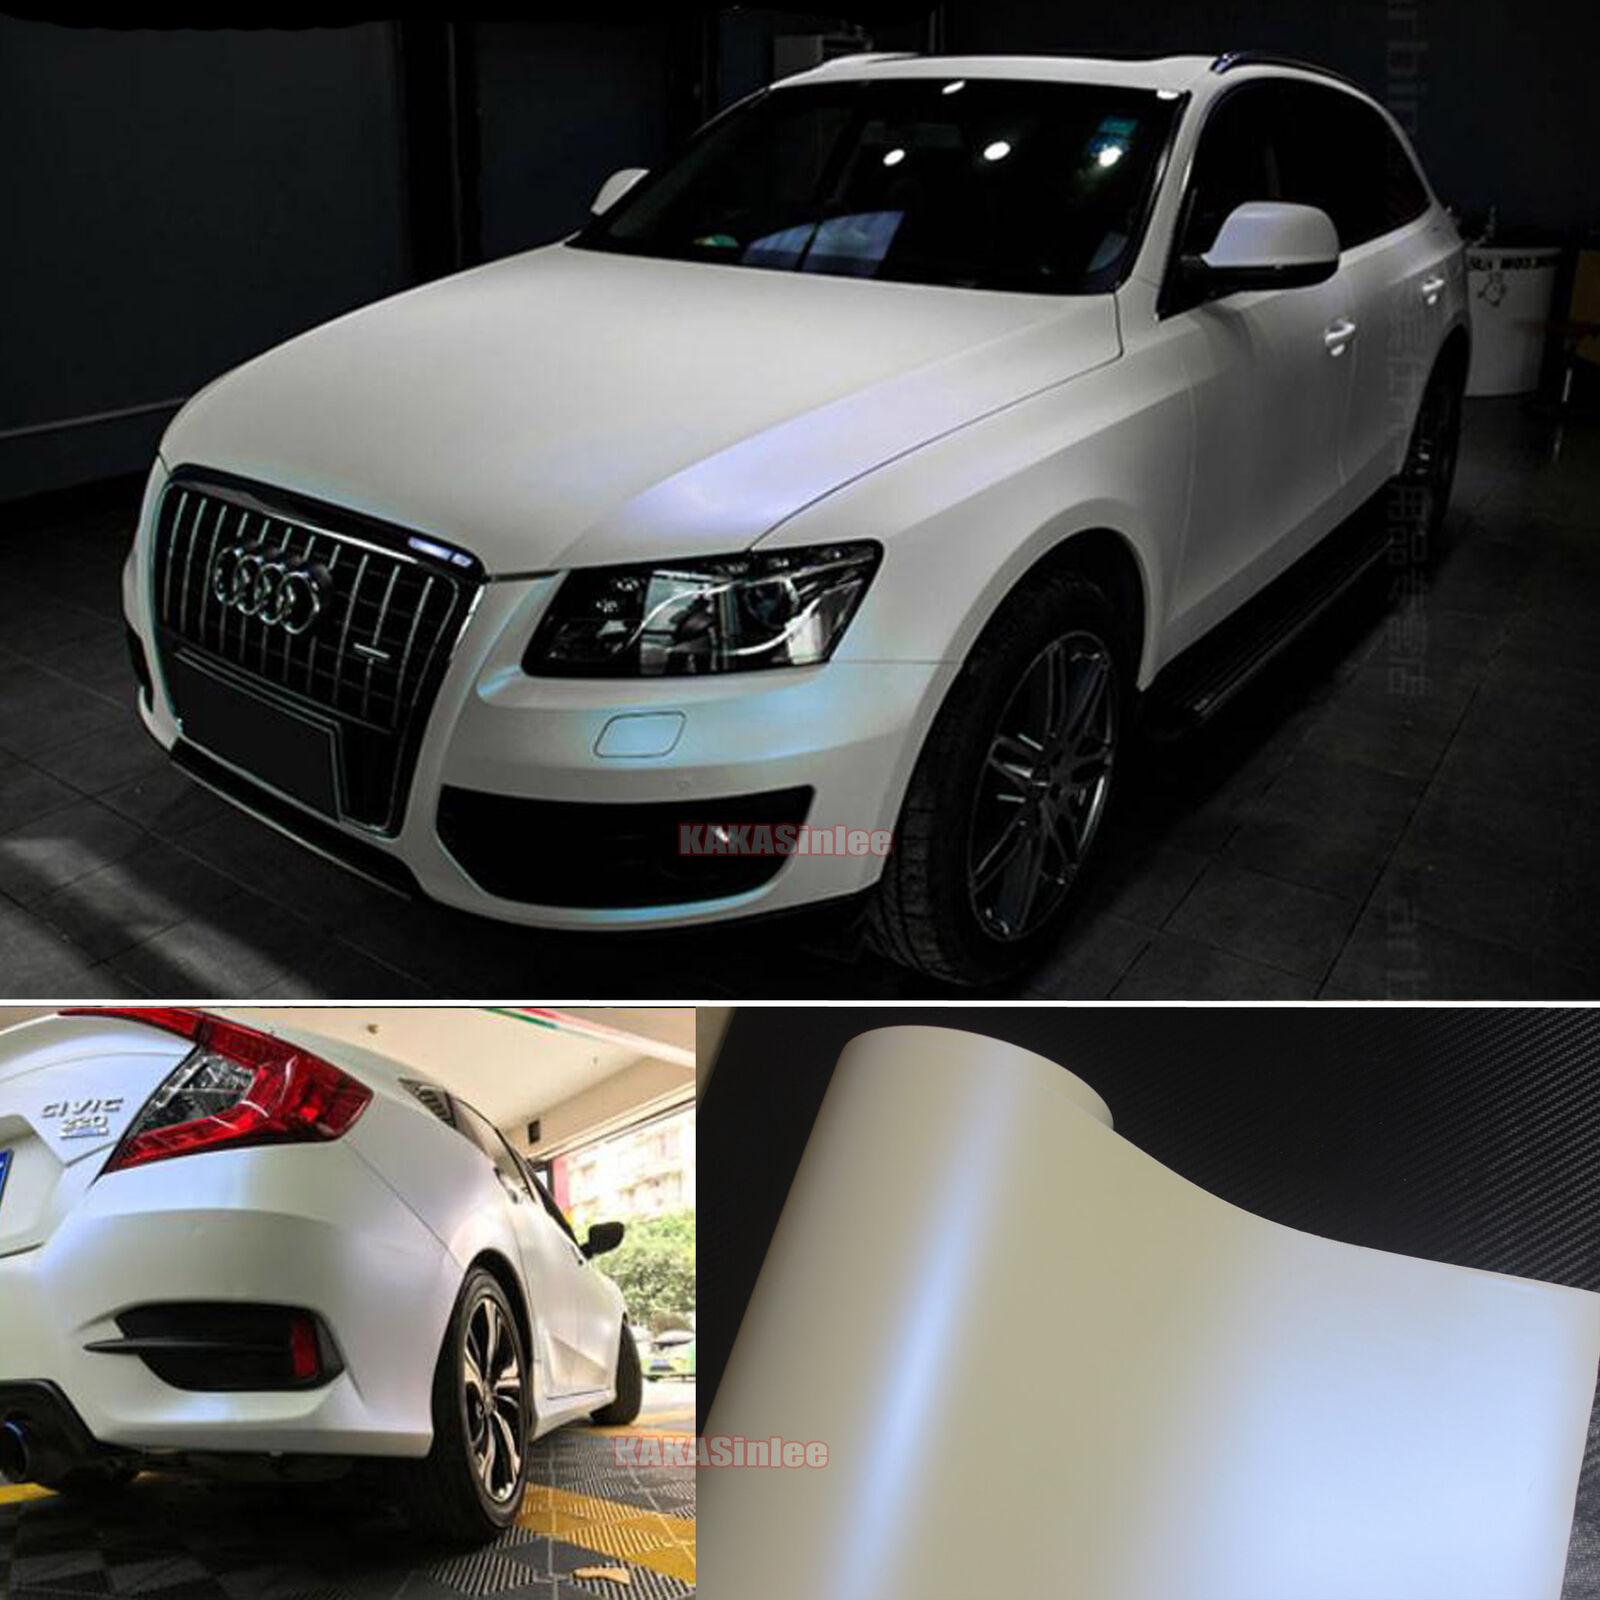 Diy Matte Entire Car Wrap Pearl White To Blue Chameleon